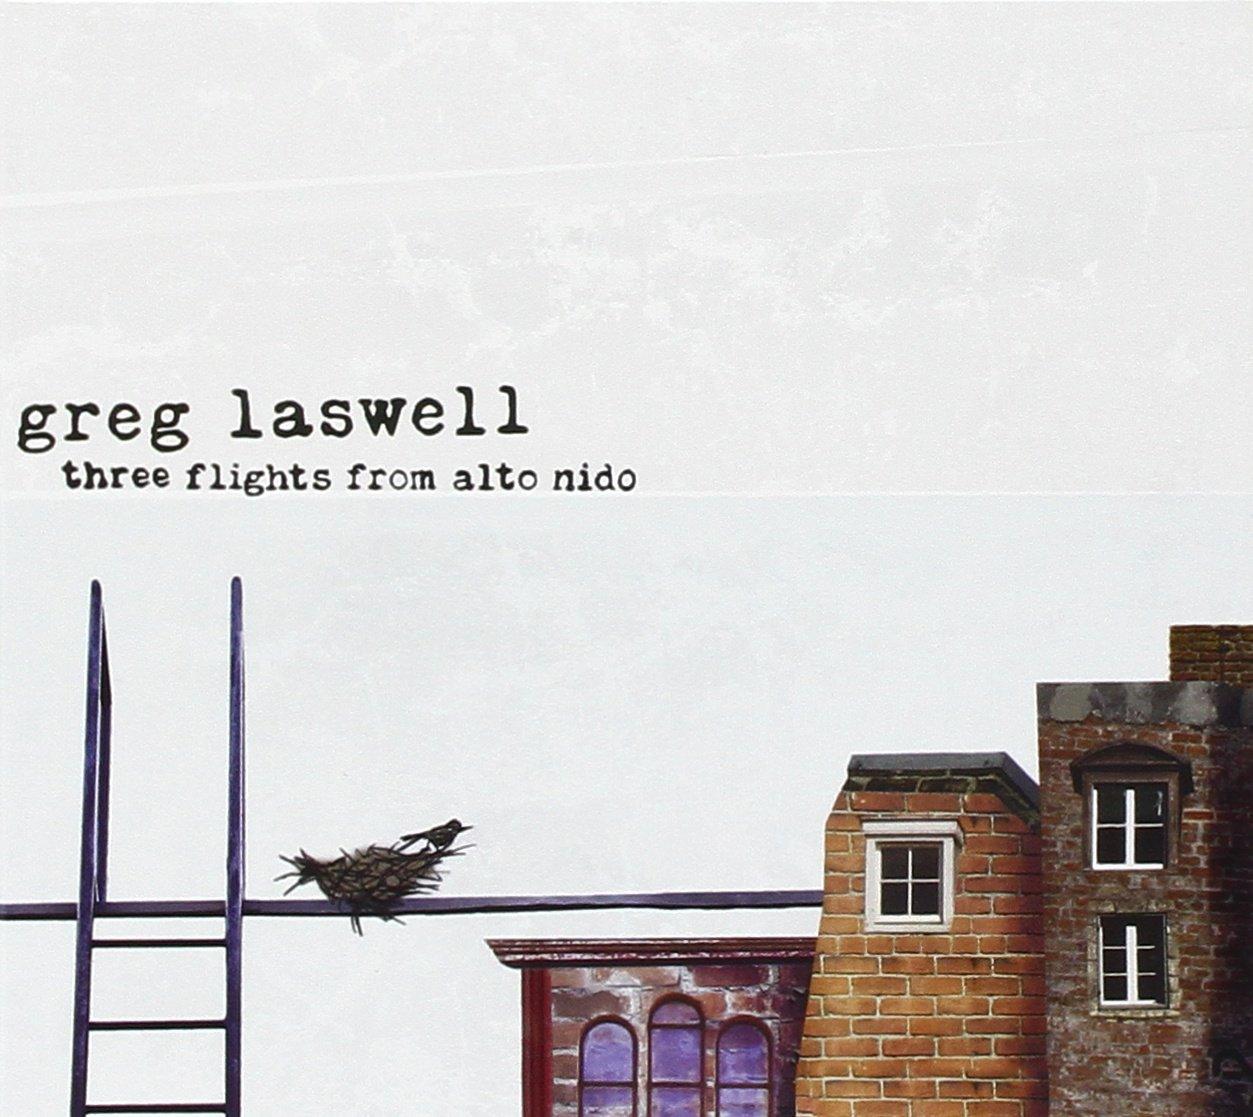 Greg Laswell - Three Flights From Alto Nido - Amazon.com Music